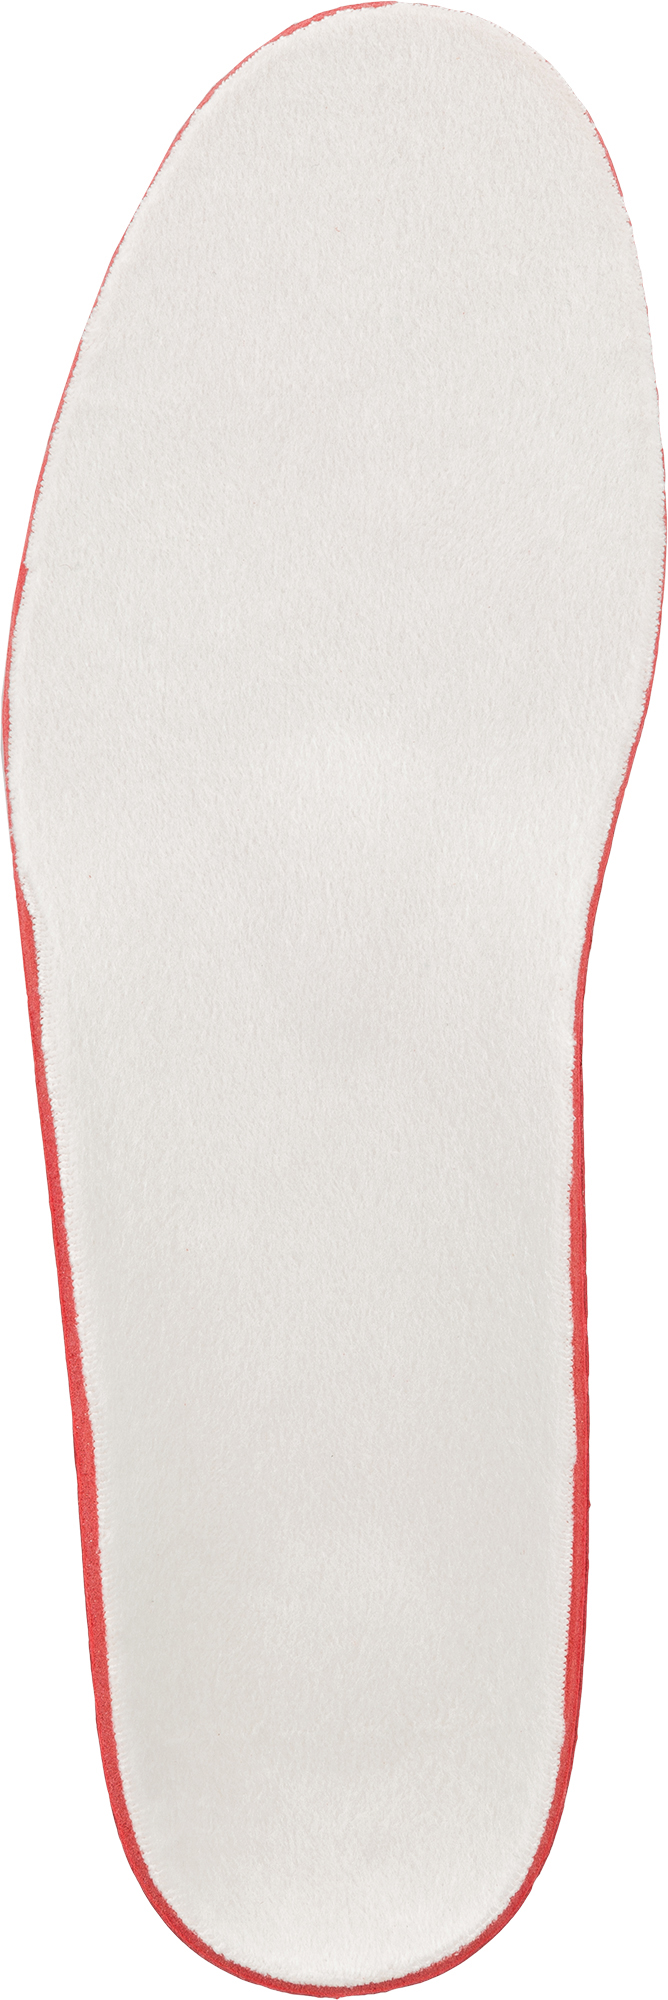 Woly Стельки анатомические зимние Woly Warm Footbed, размер 46